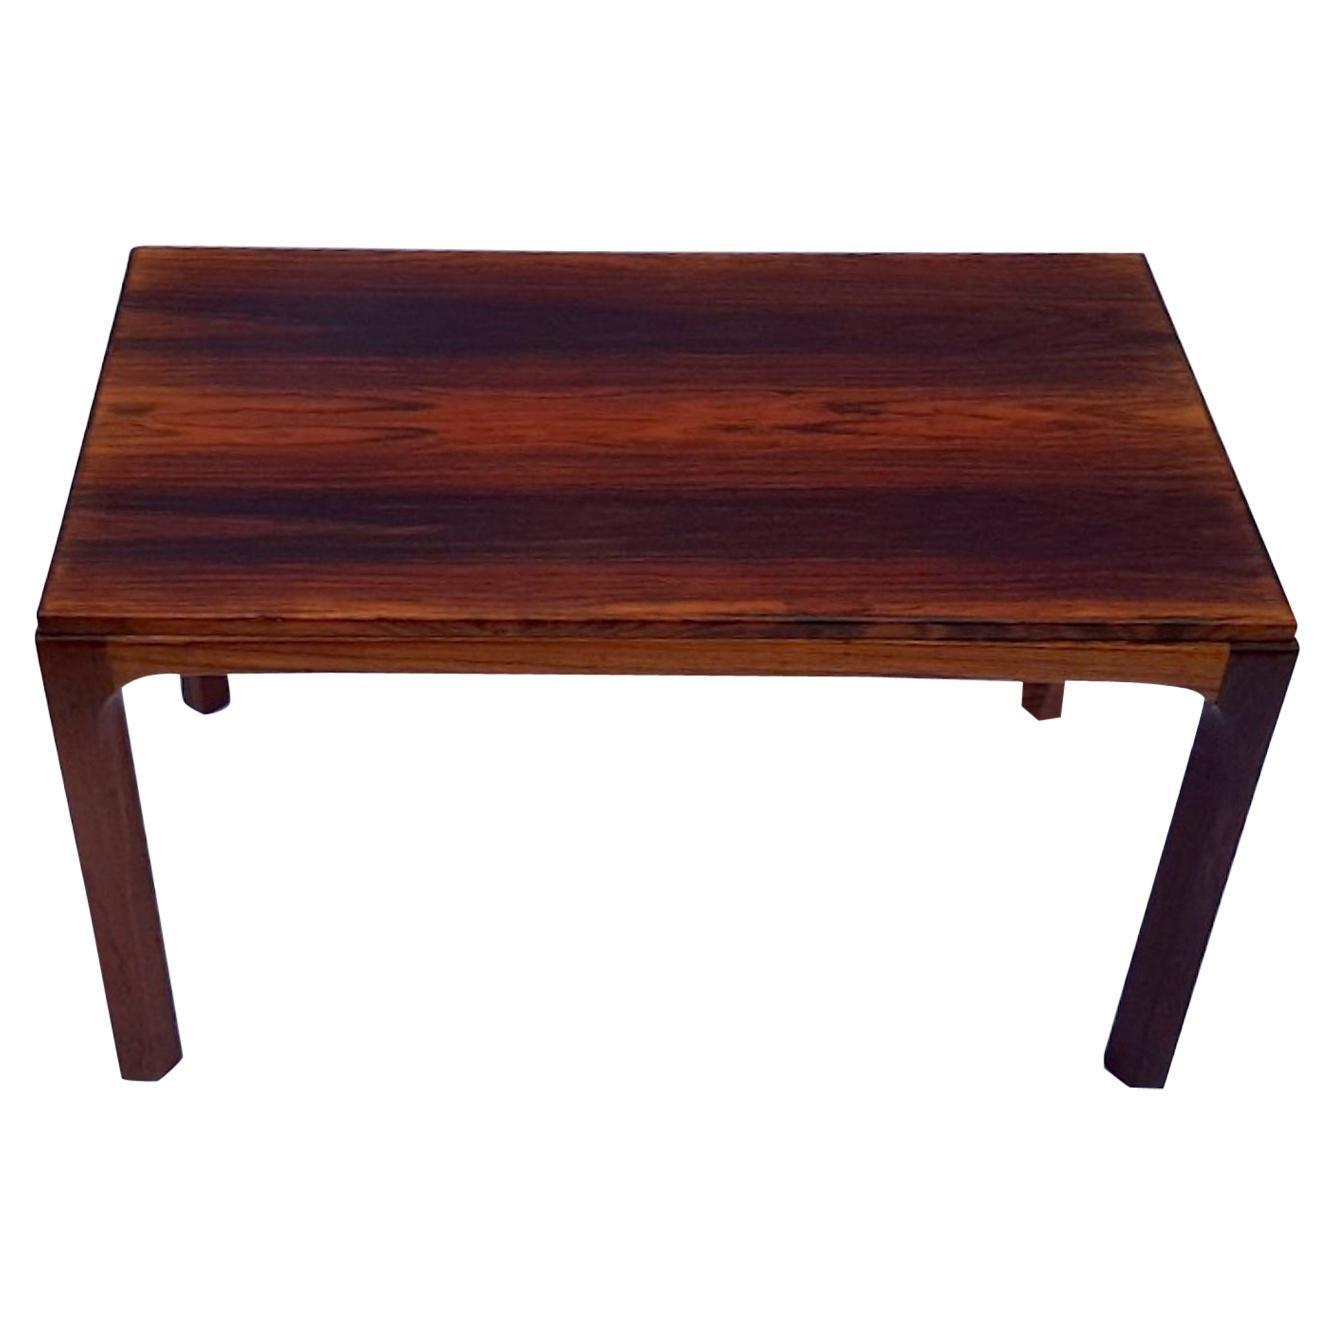 Kai Kristiansen for Aksel Kjersgaard Rosewood Side Table No. 381, Danish, 1950s